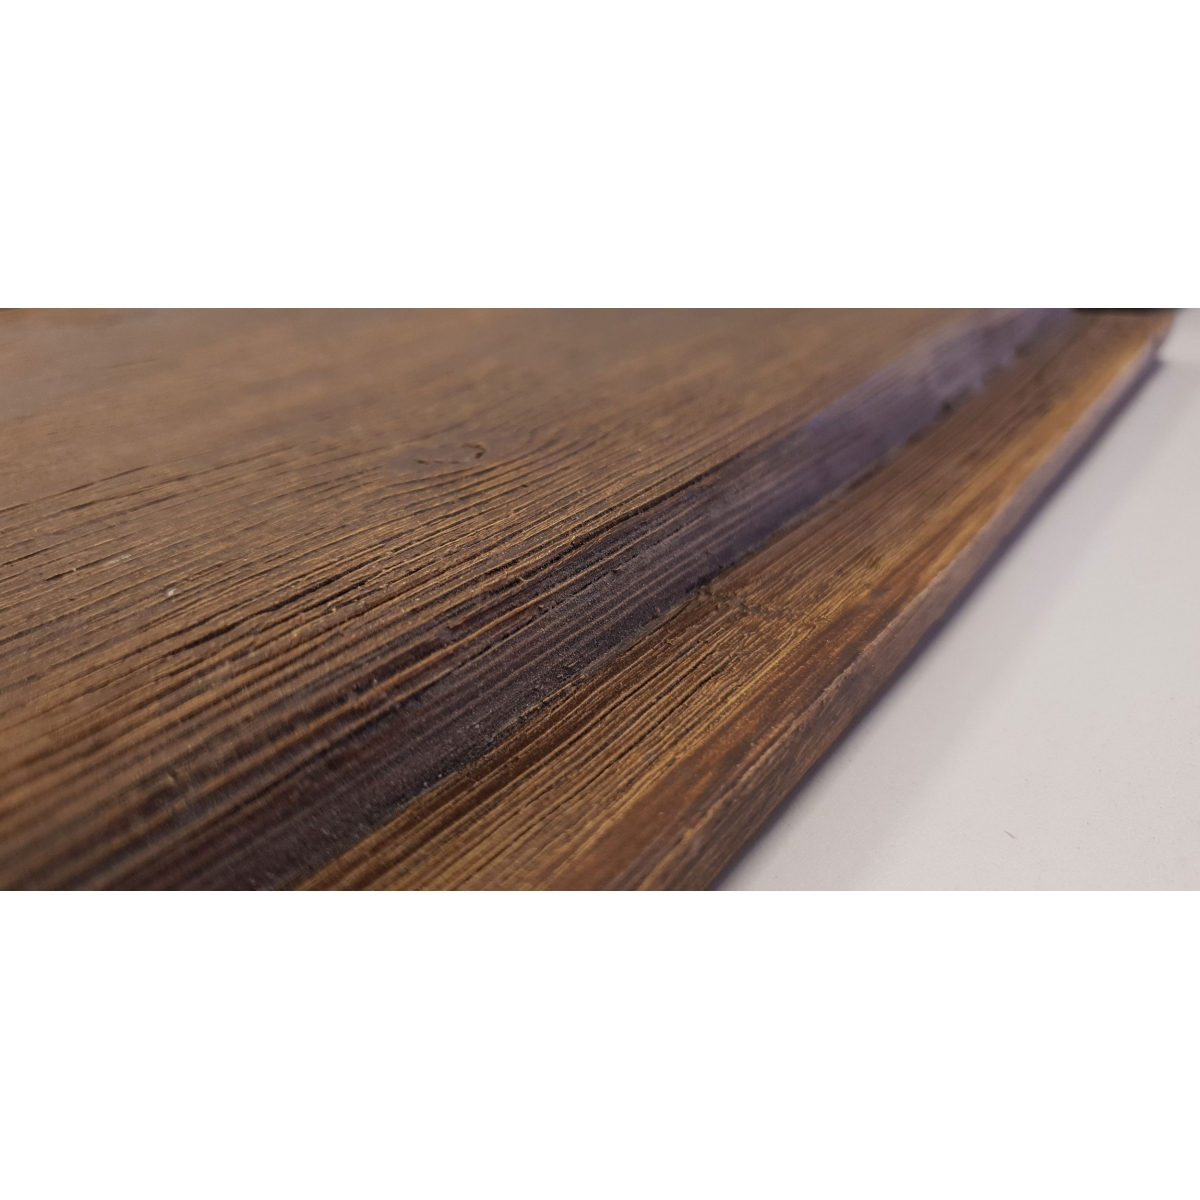 Paneles imitación madera de poliuretano Grupo Unamacor